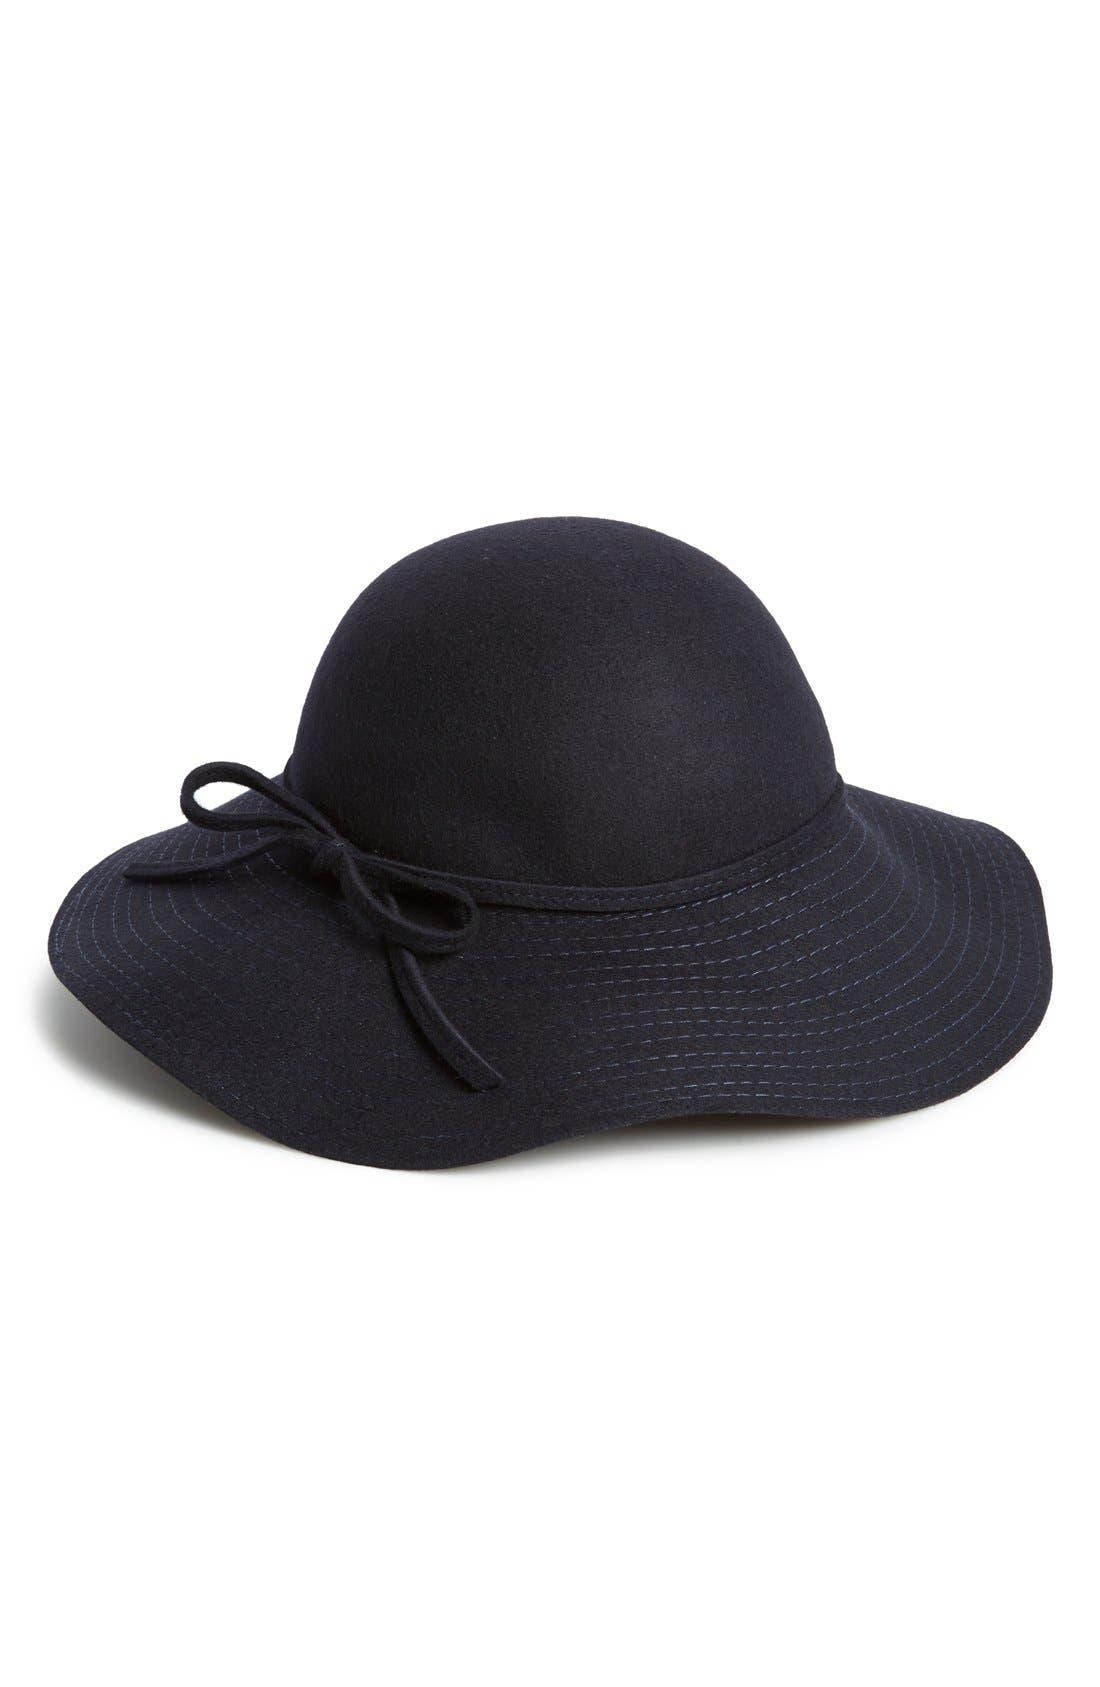 Main Image - Dorfman Pacific 'Sara Jess' Hat